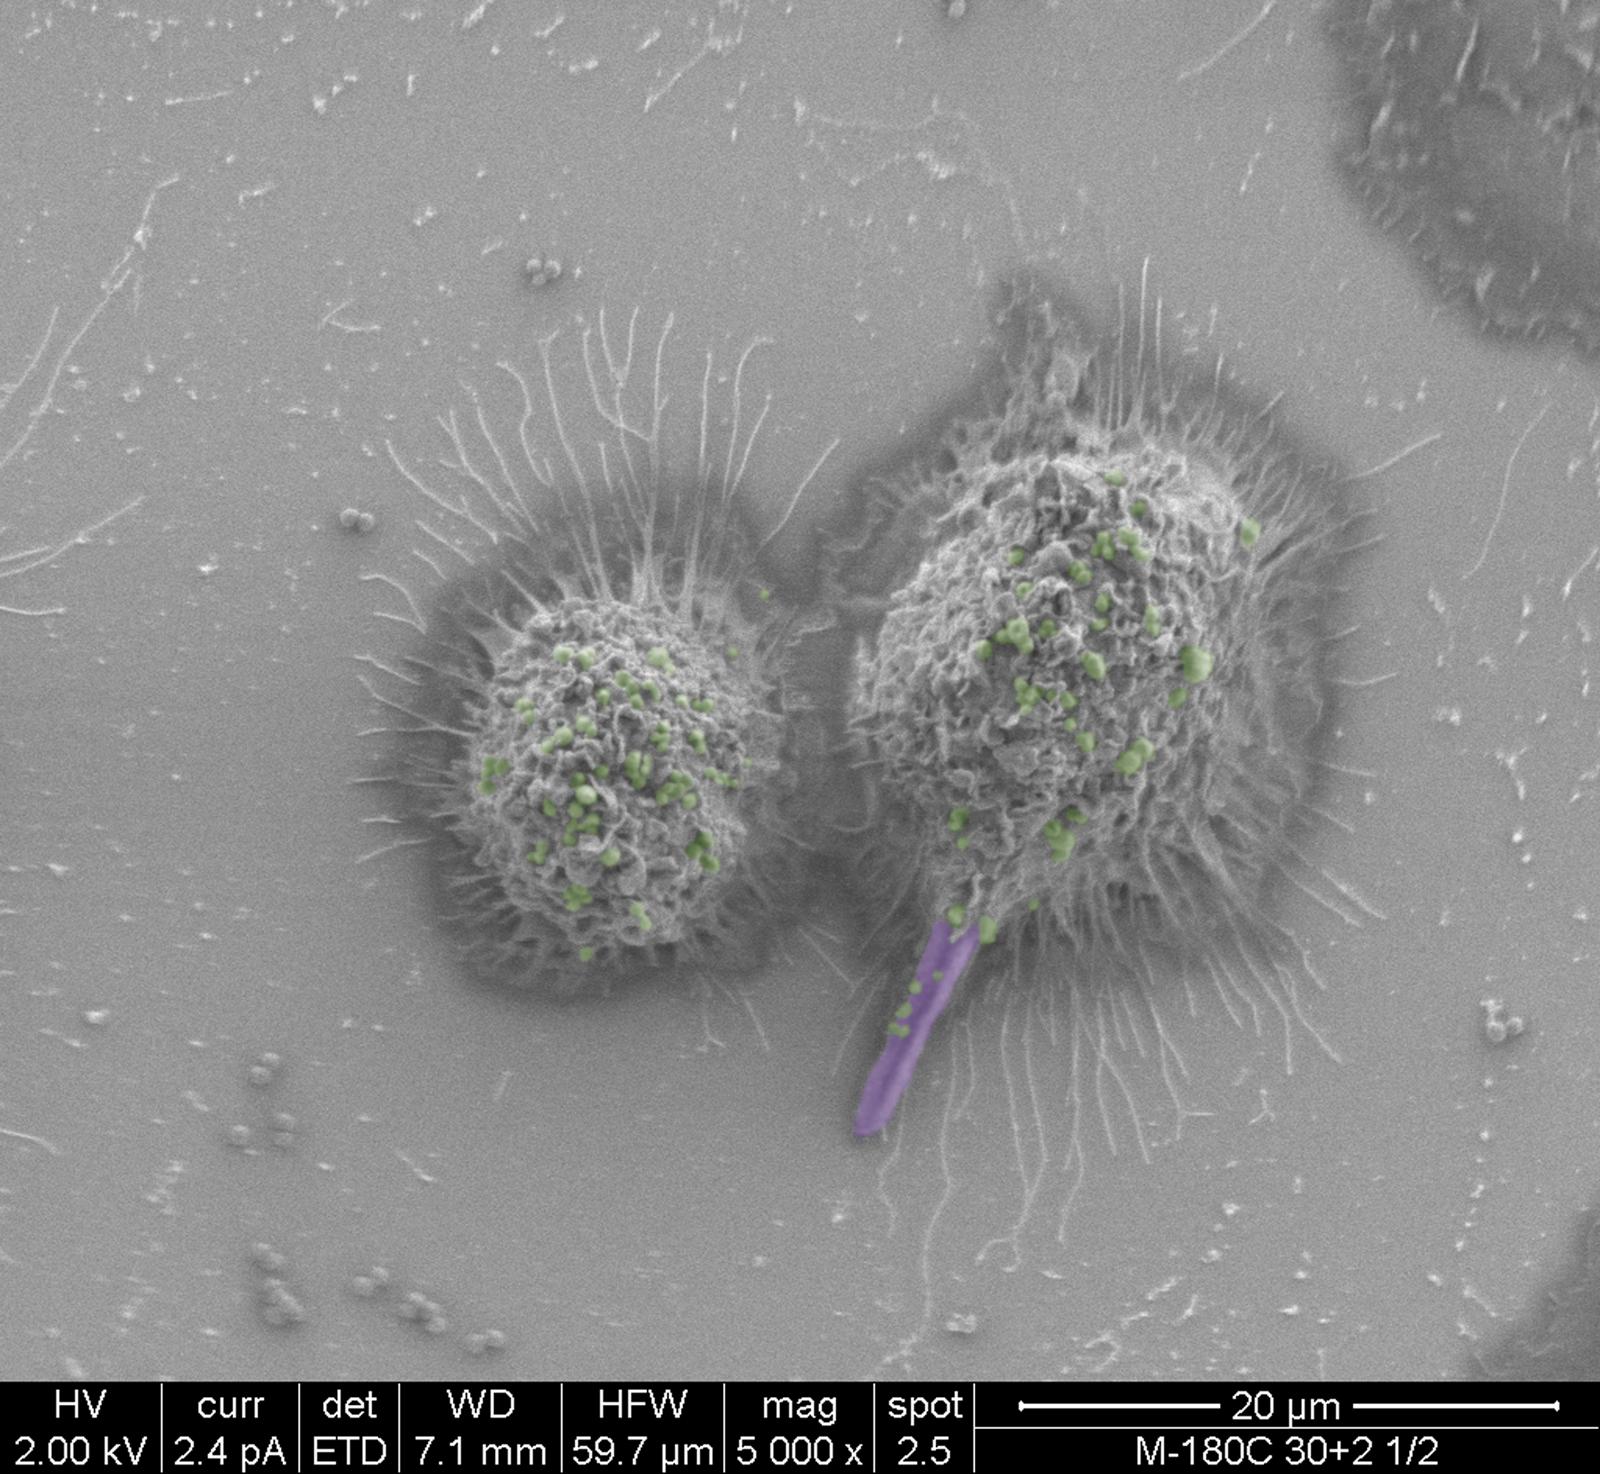 False-colored scanning electron micrographs depicting the co-phagocytosis of <i>C</i>. <i>albicans</i> and <i>S</i>. <i>aureus</i> by murine macrophages.